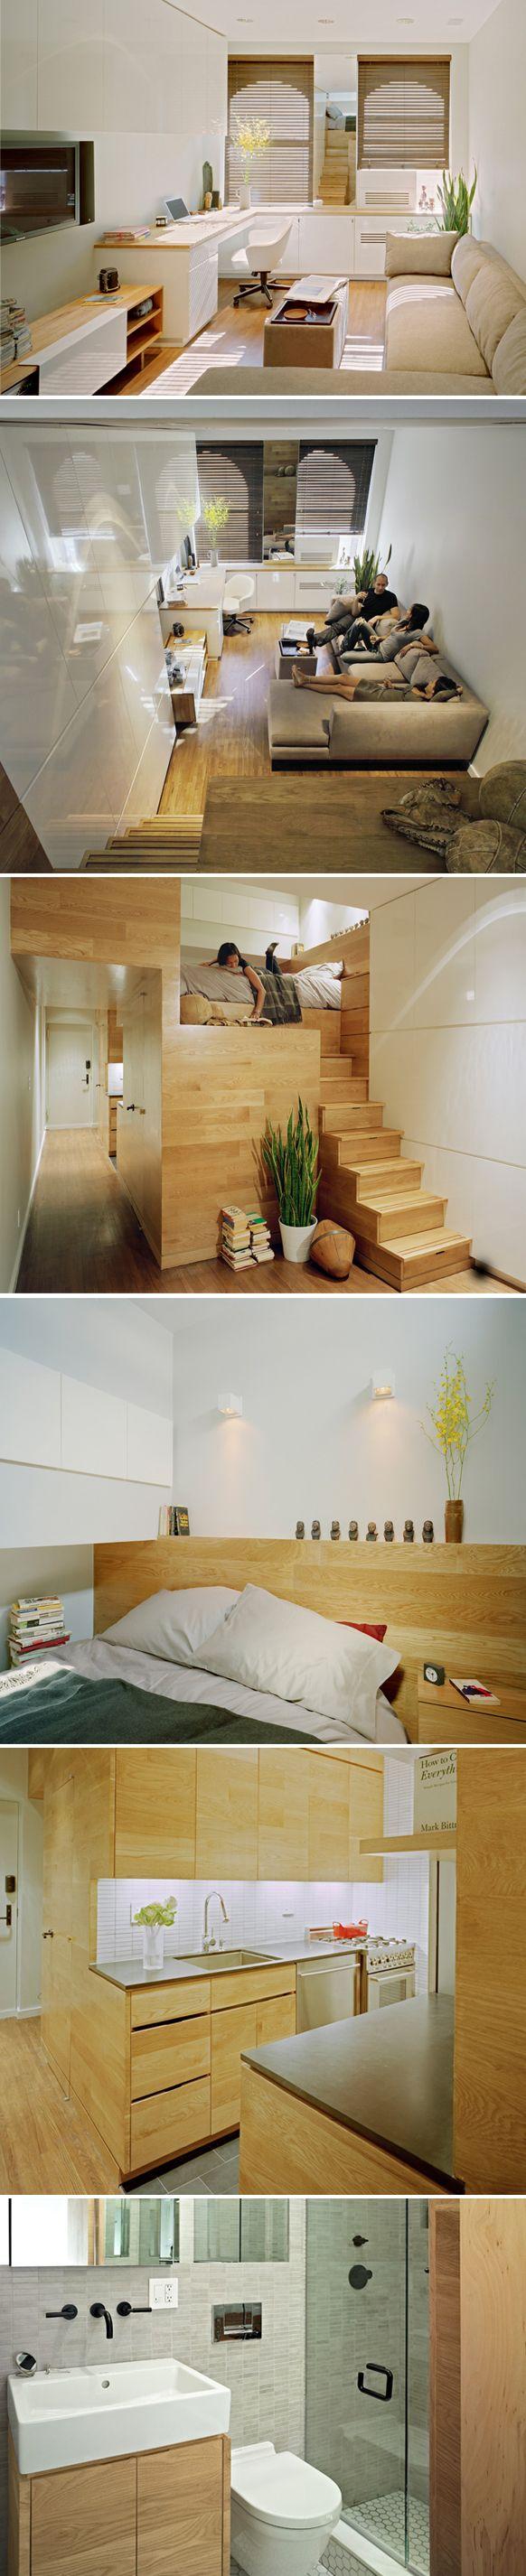 Cute Studio Apartment L I V I N G R O O M Pinterest